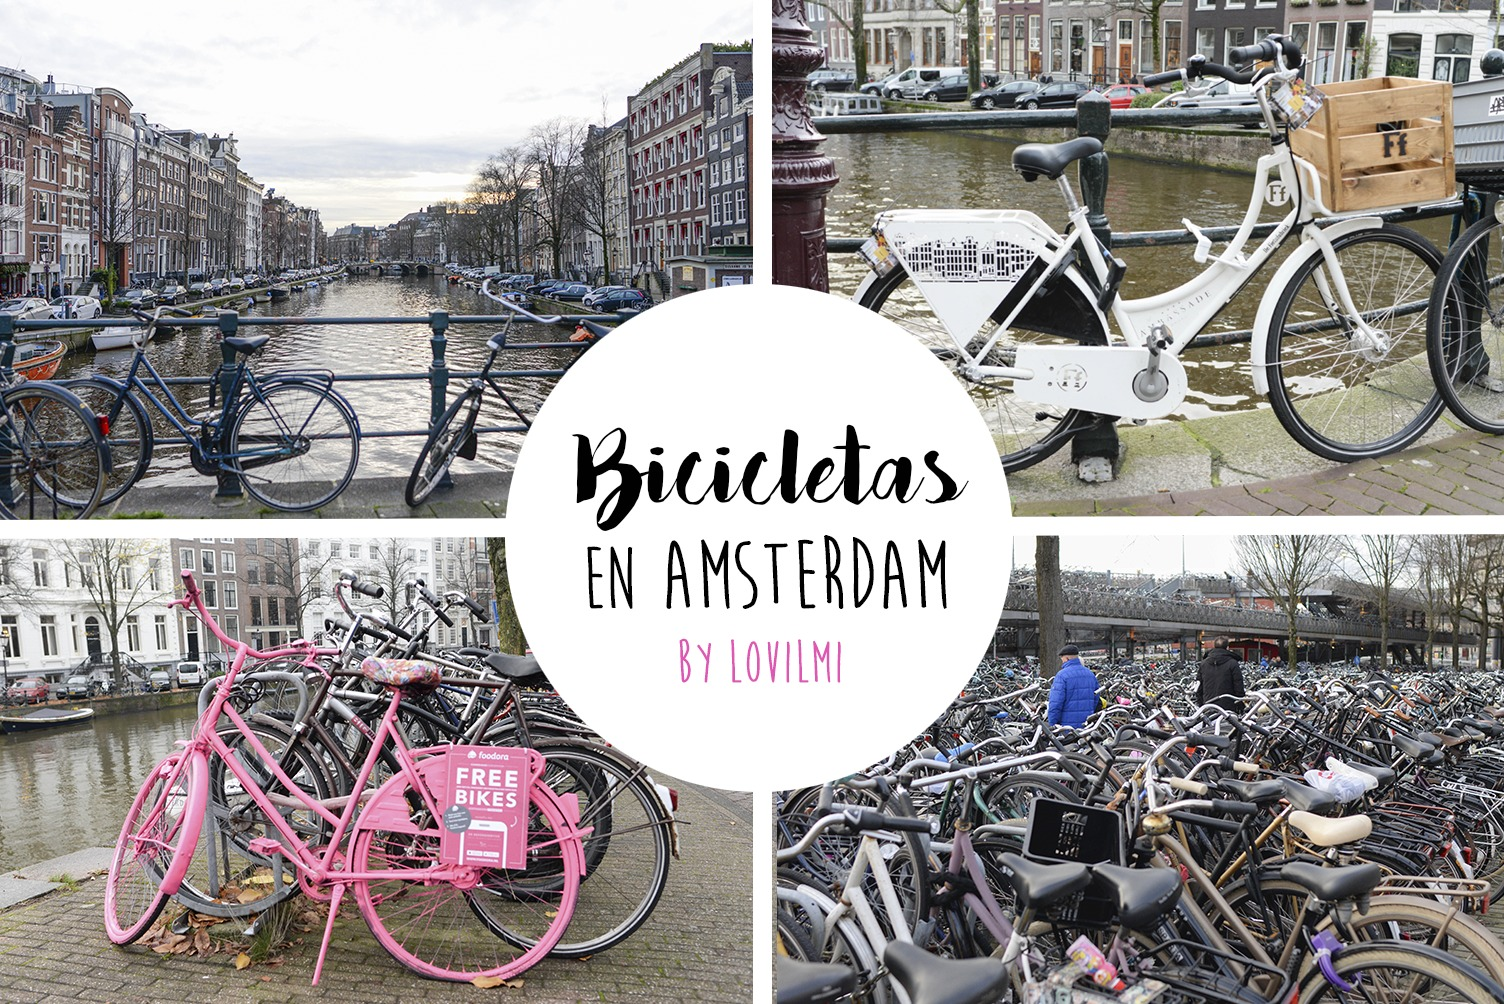 bicicletasenamsterdampostlovilmiblog